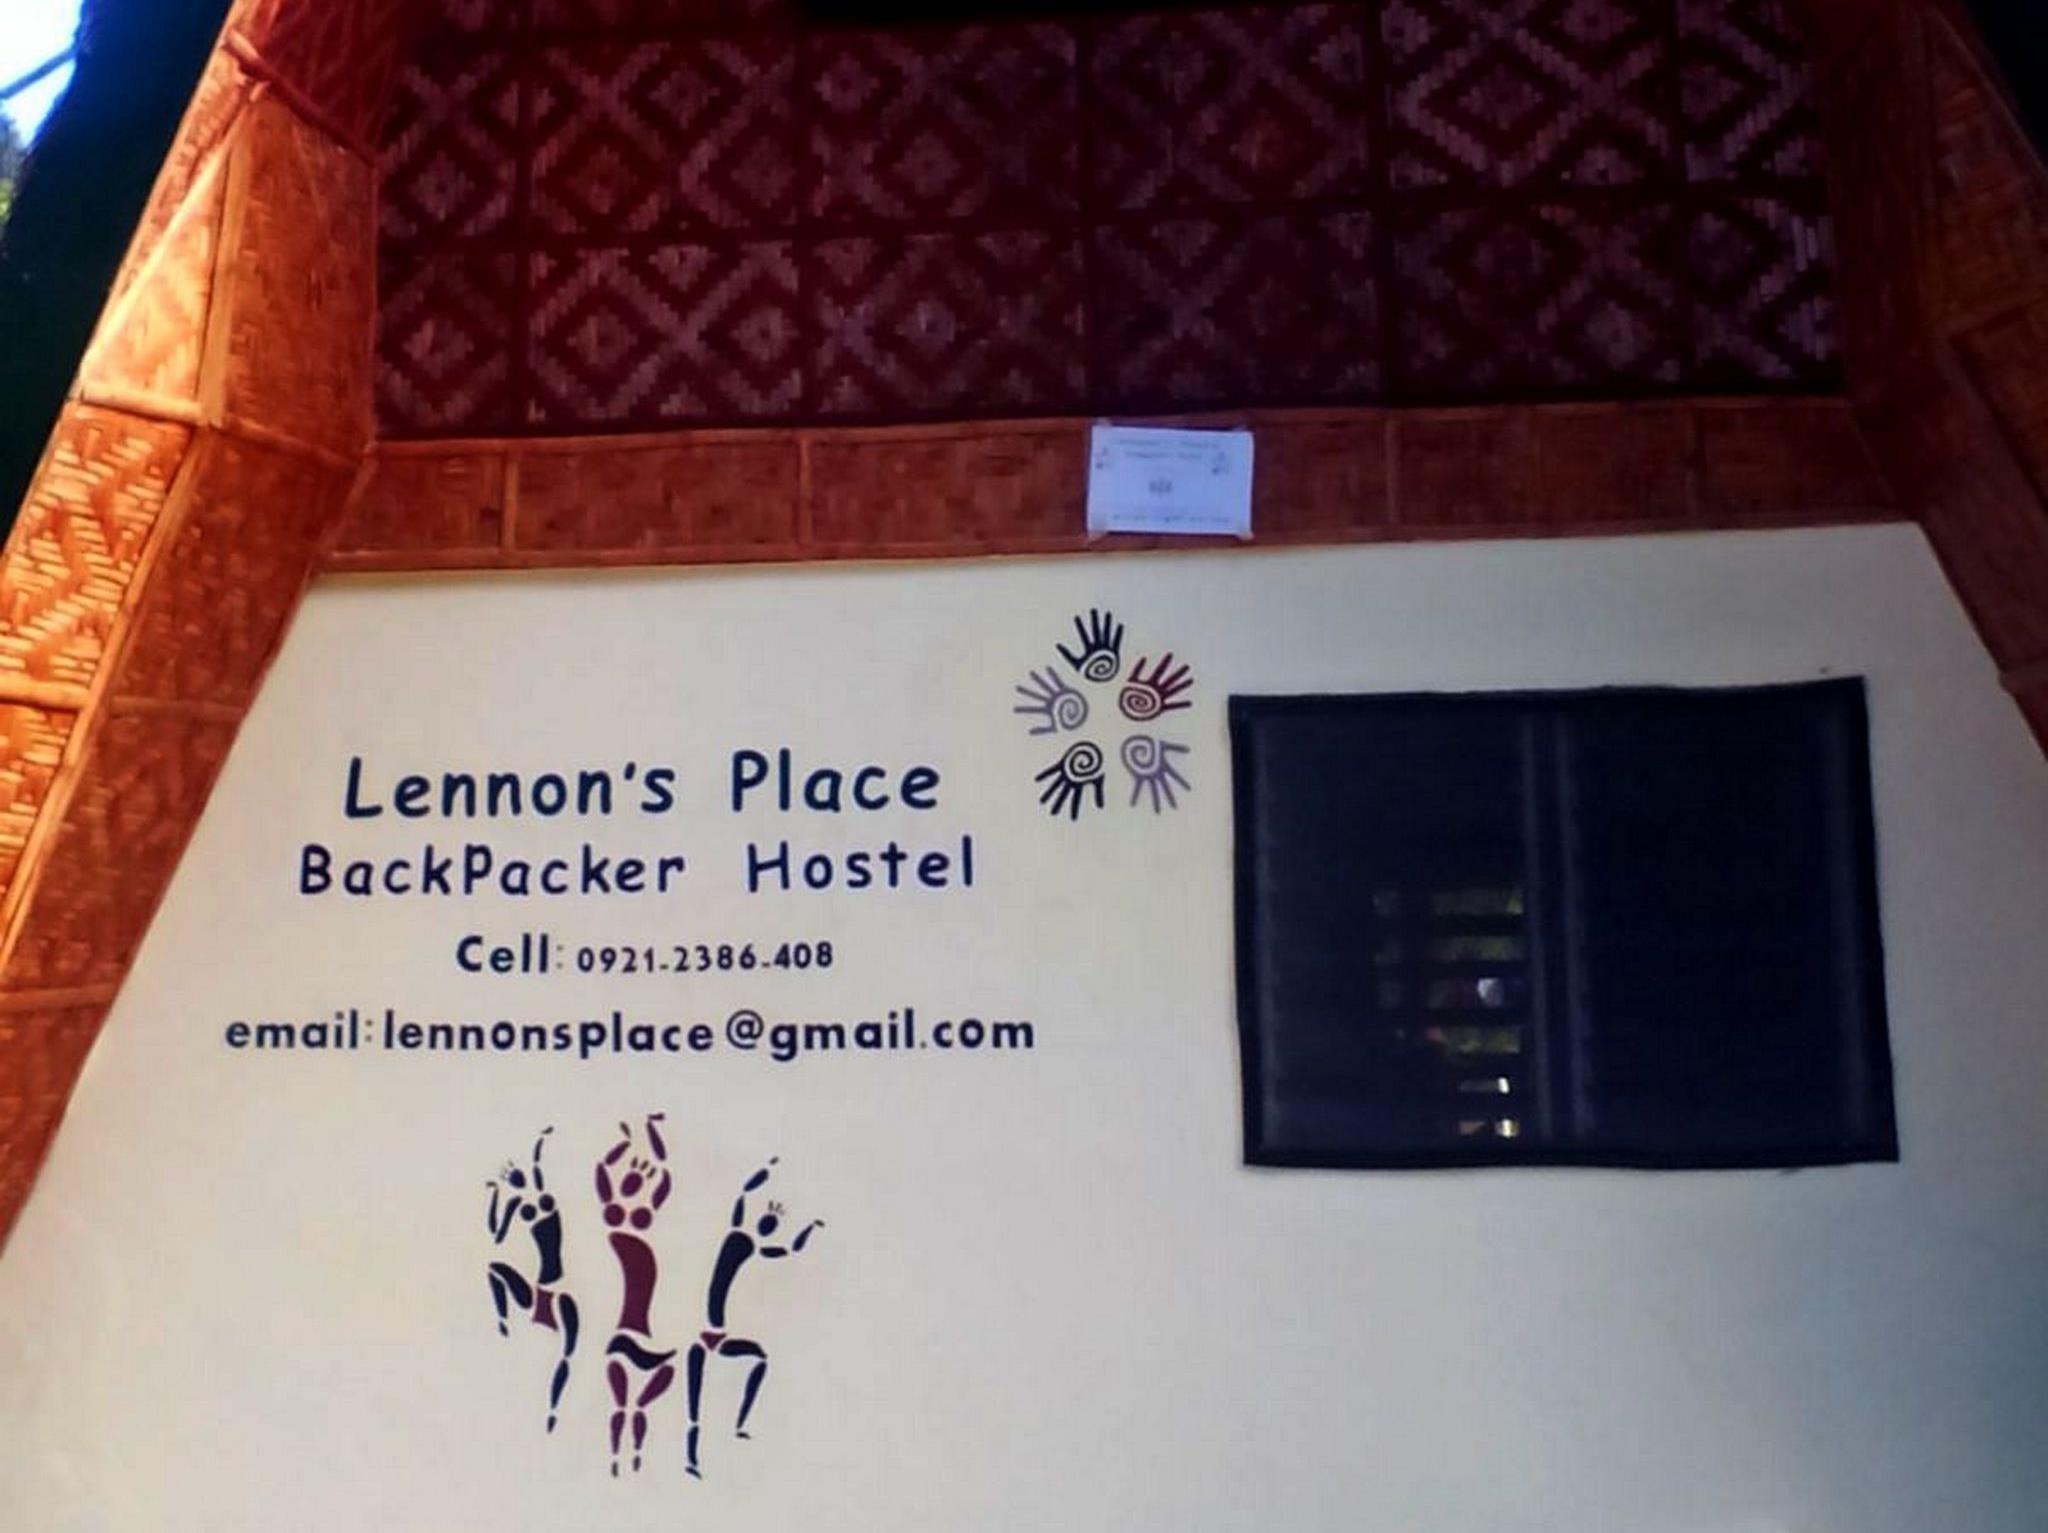 Lennons Place Backpacker Hostel